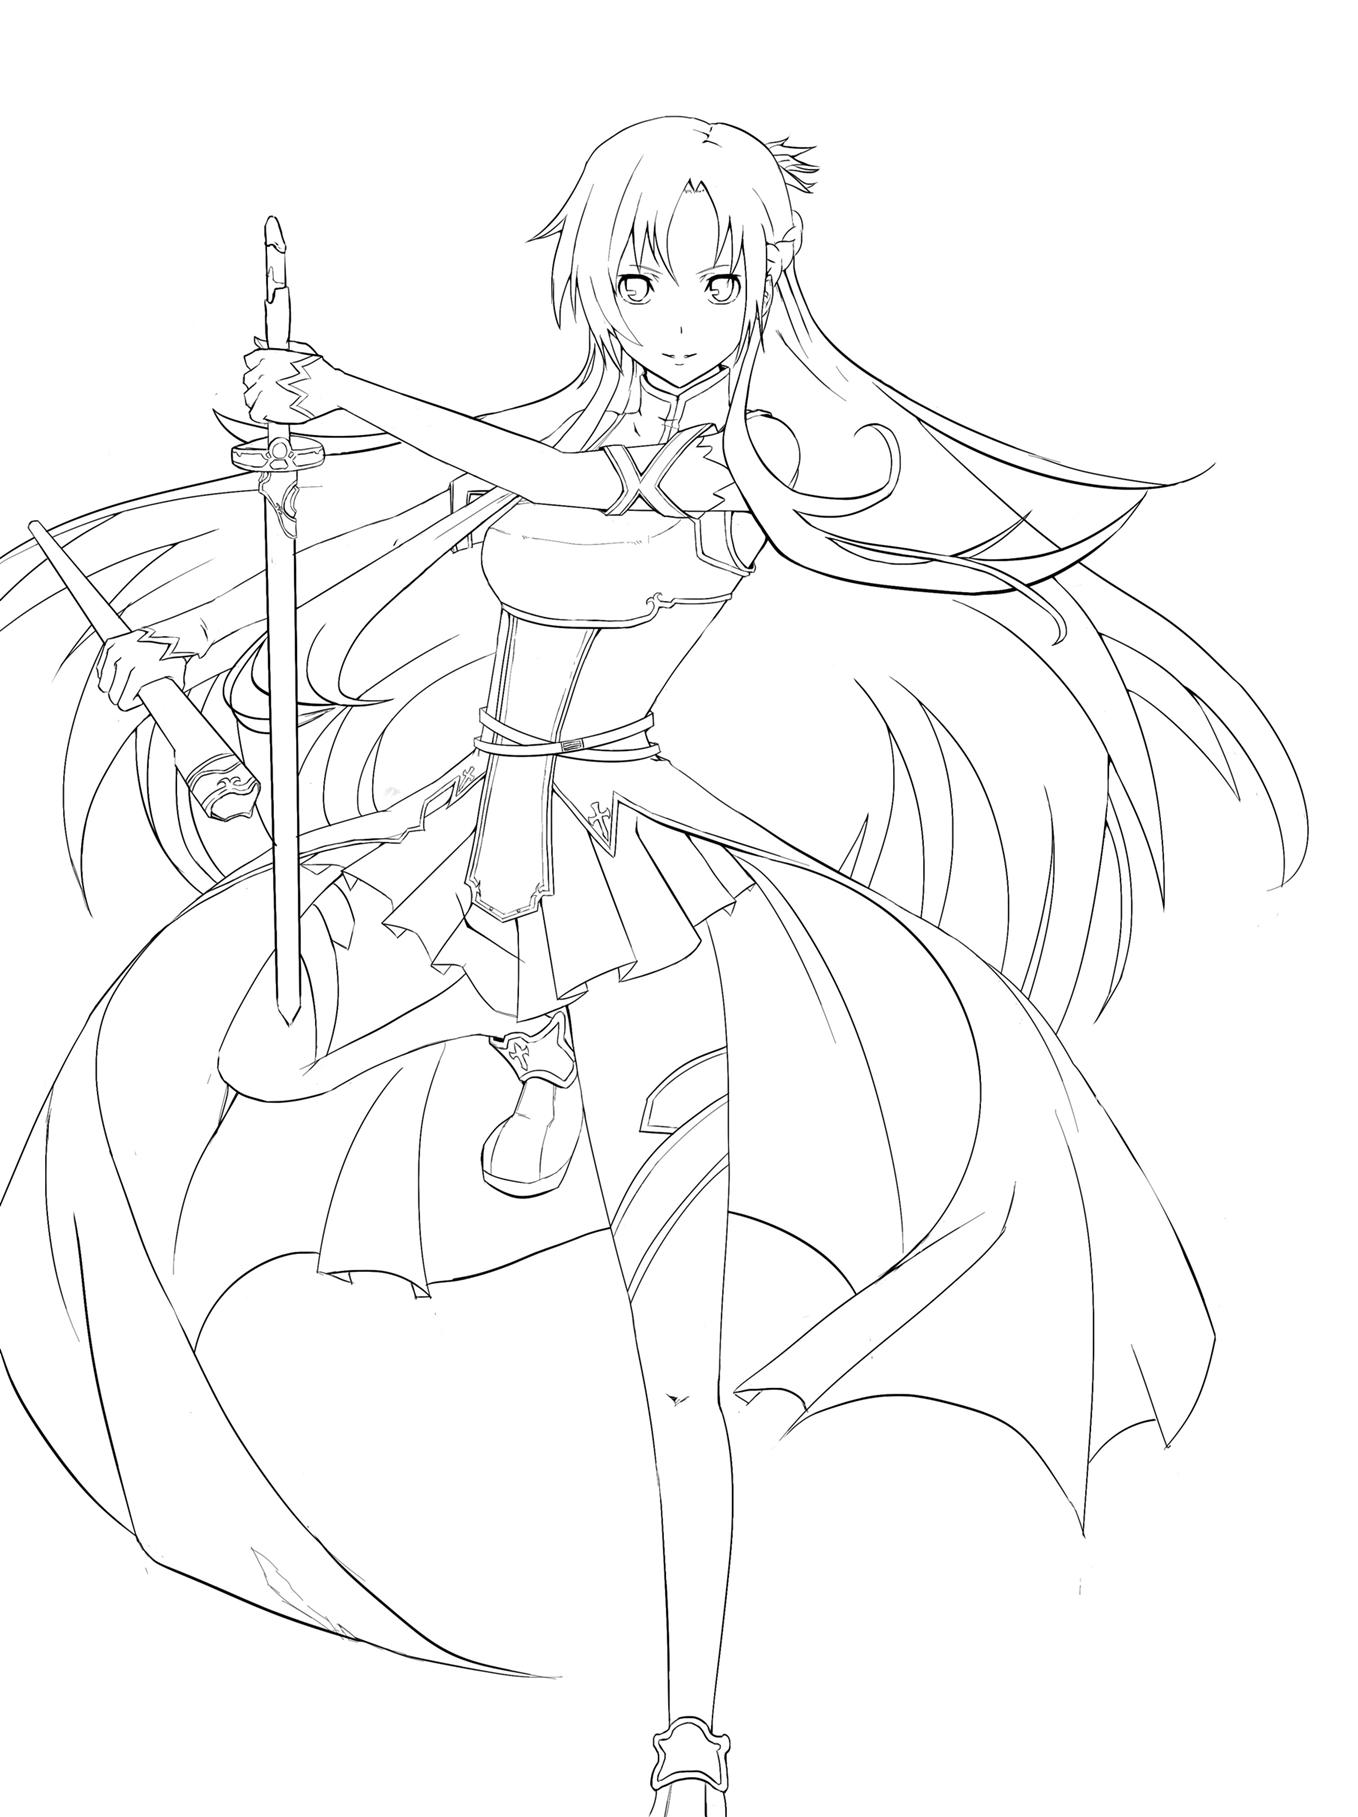 Asuna lineart sword art online by vaghot on deviantart for Sword art online coloring pages